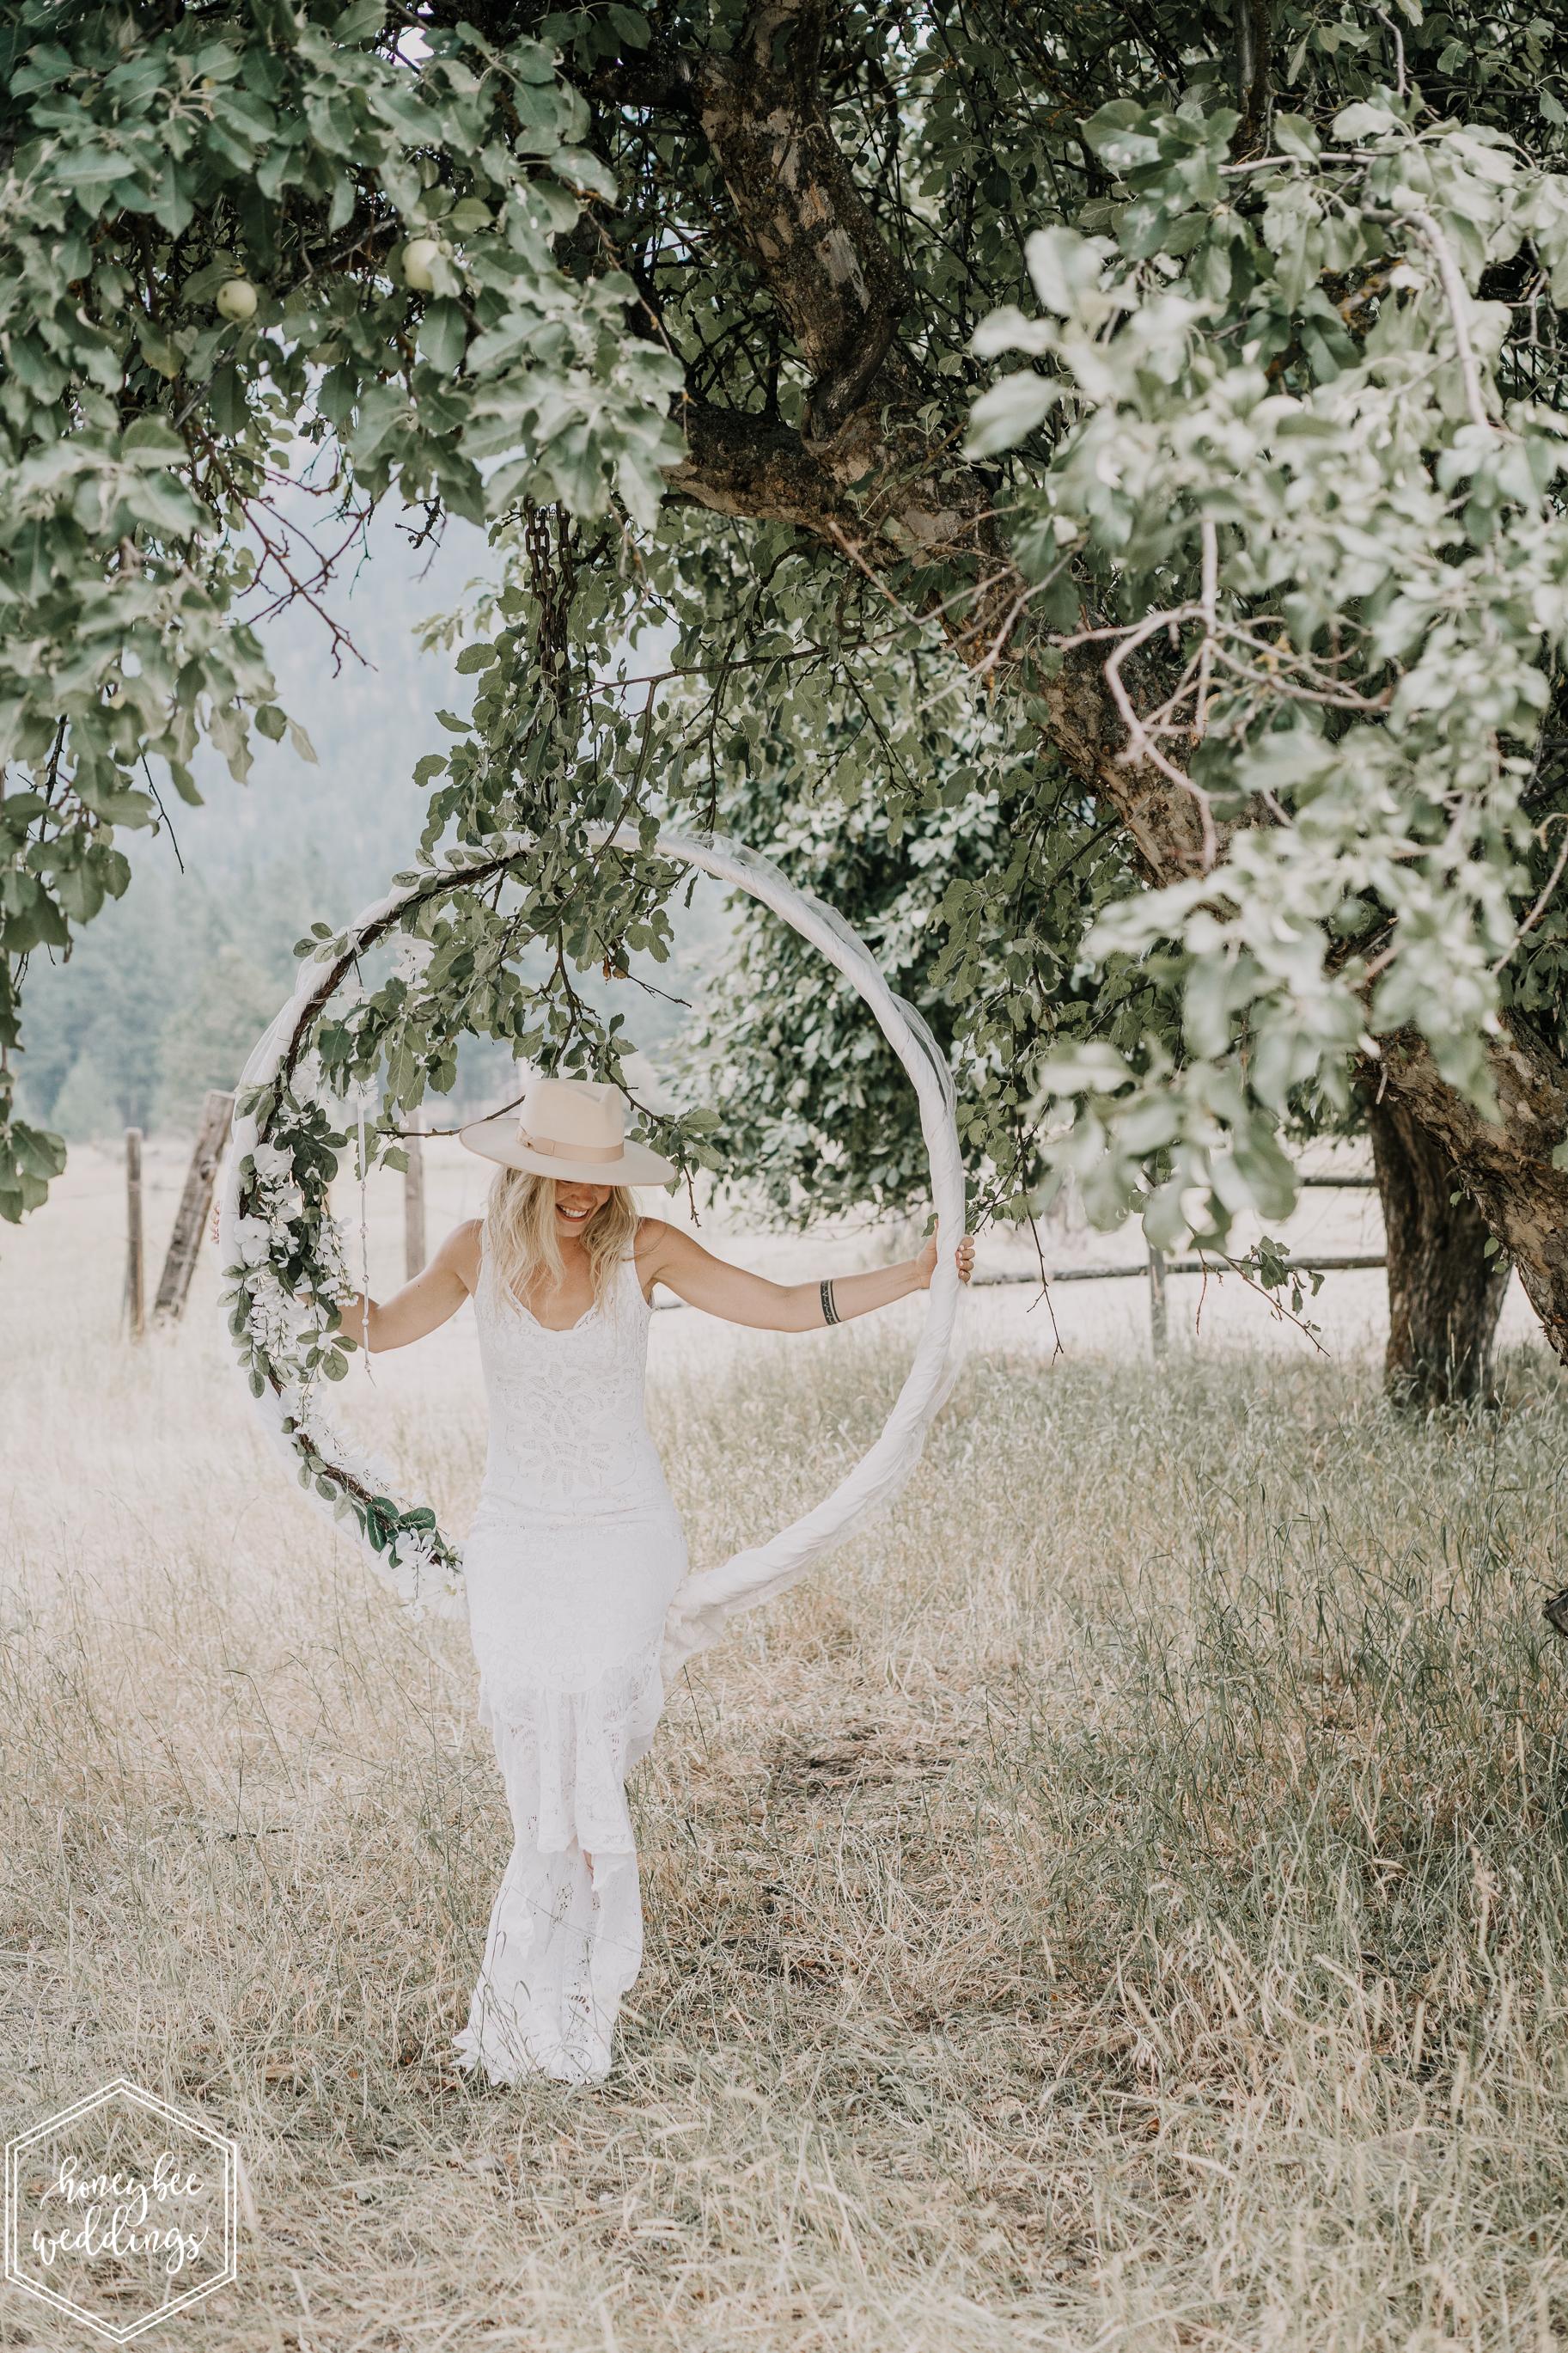 0133Alberton Wedding_Montana Wedding Photographer_Anneliesa Bashaw + Wyatt Zeylawy_August 11, 2018-296.jpg